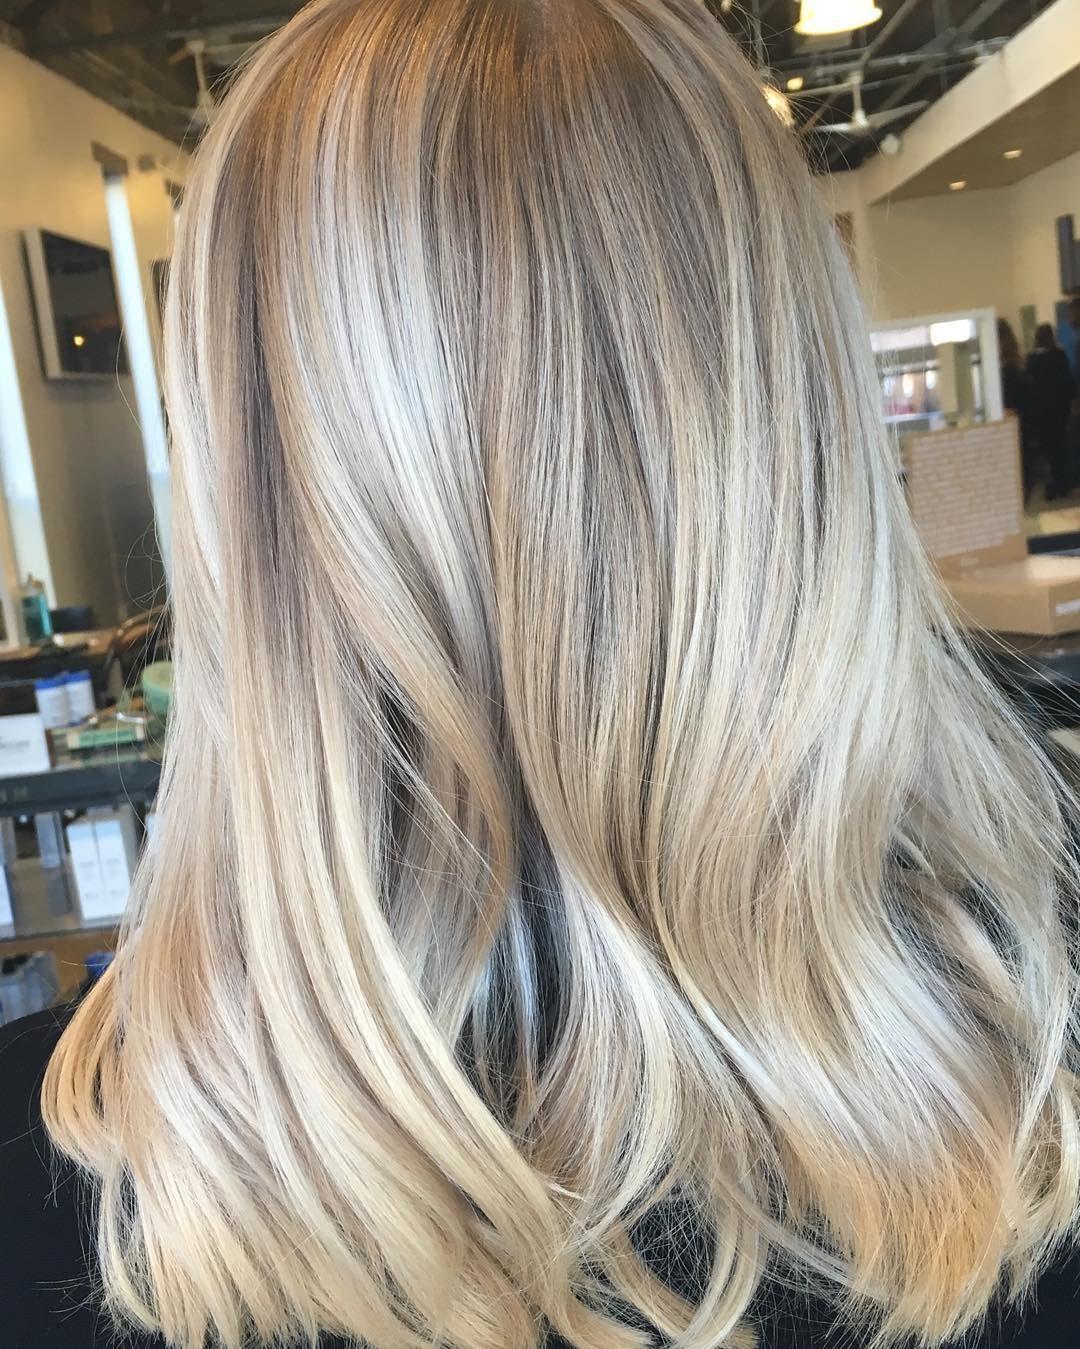 Покраска волос от темного к светлому с растяжкой цвета (20 фото)